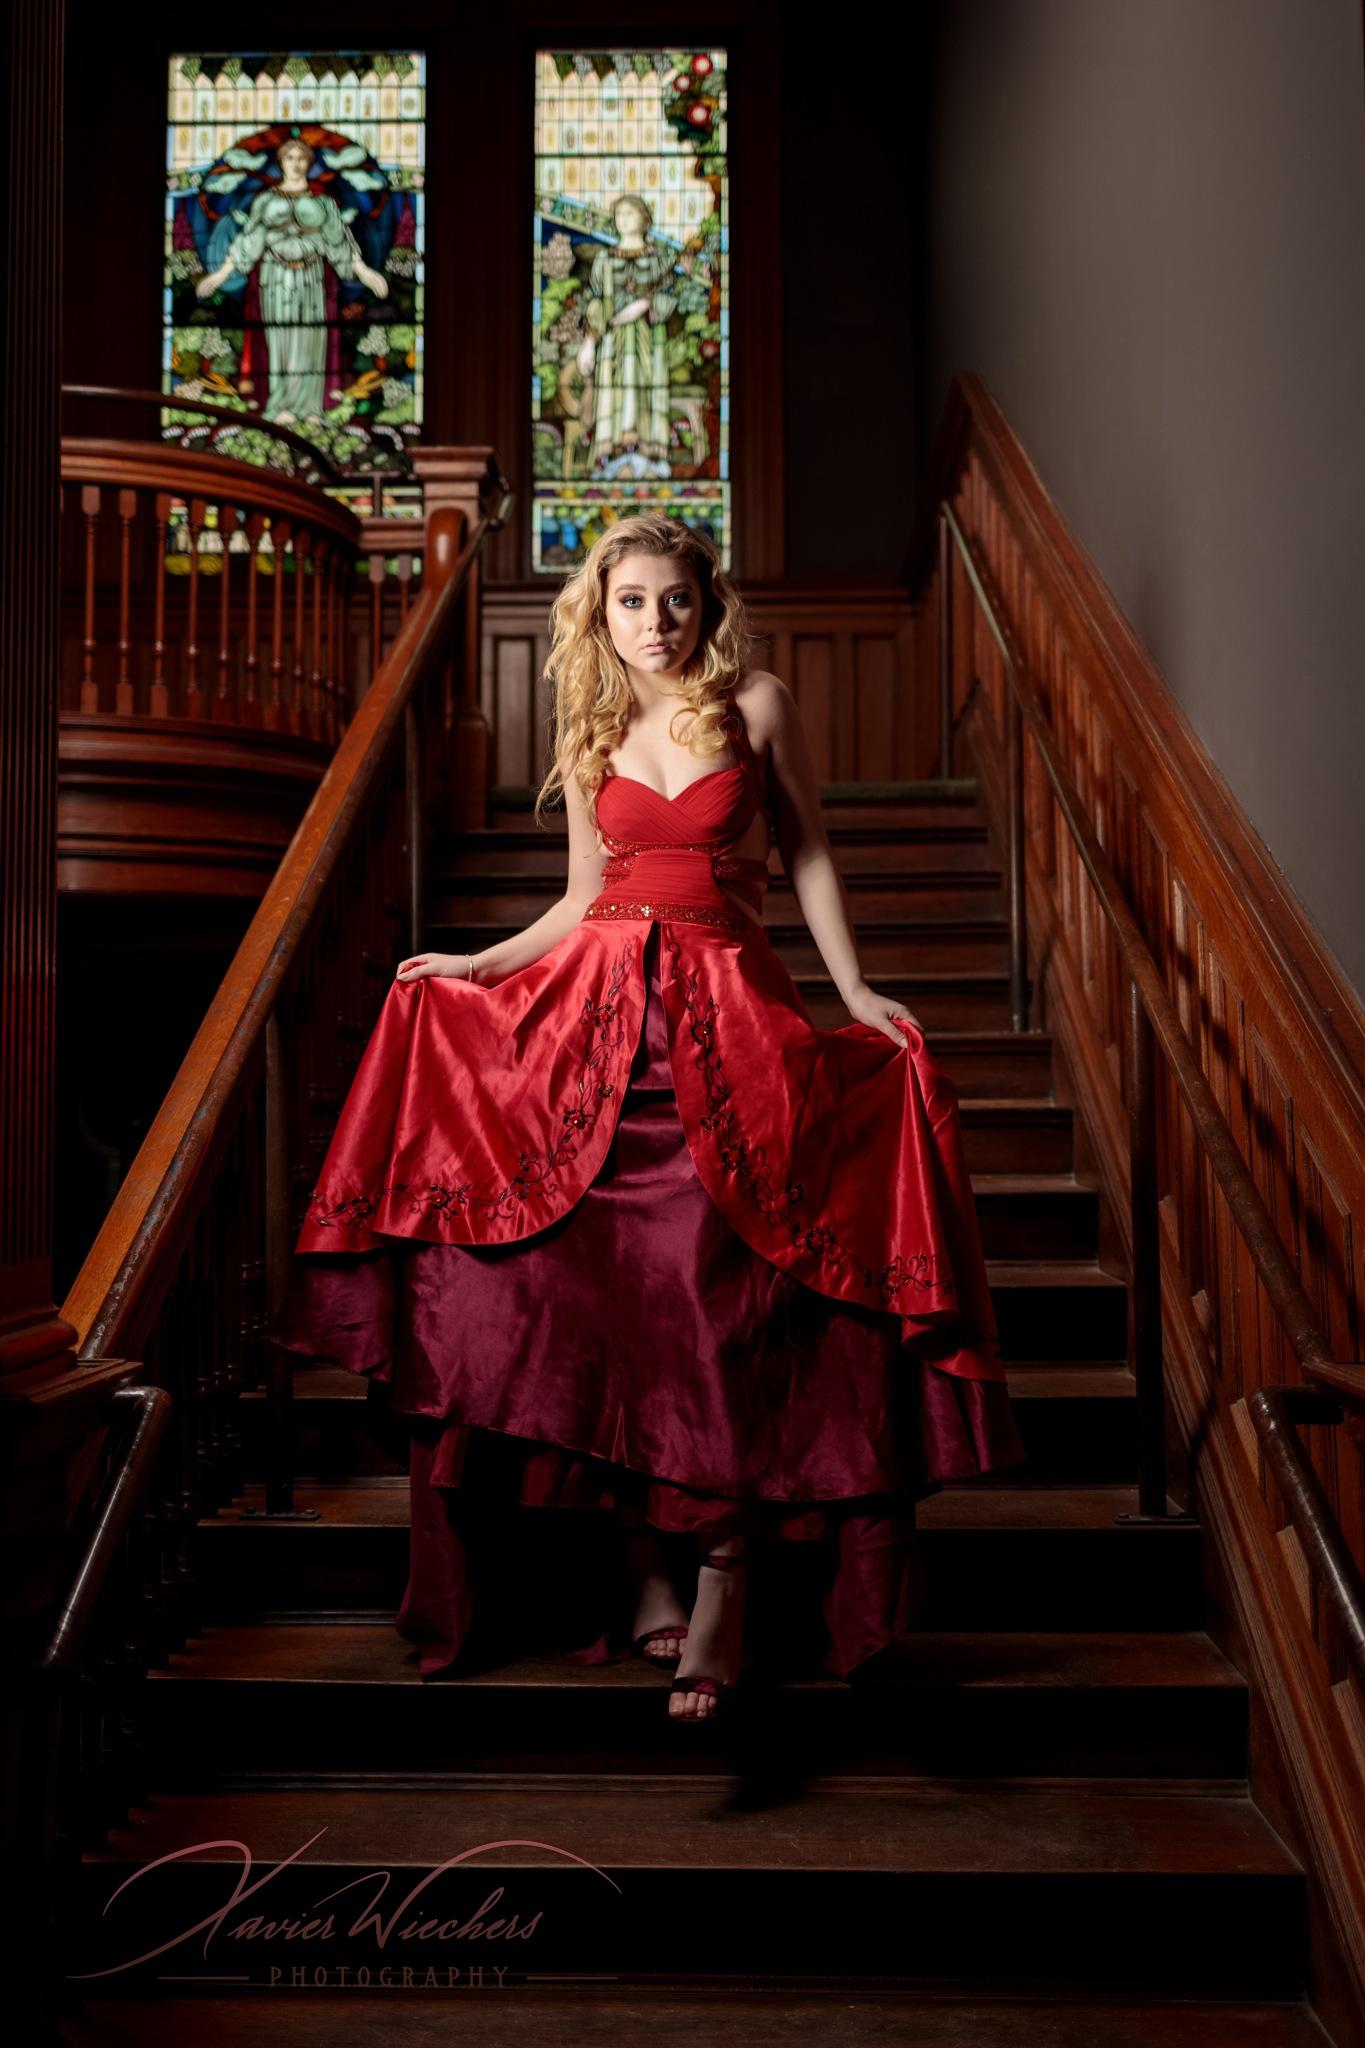 Madison - Glamour 9 by xwiechers